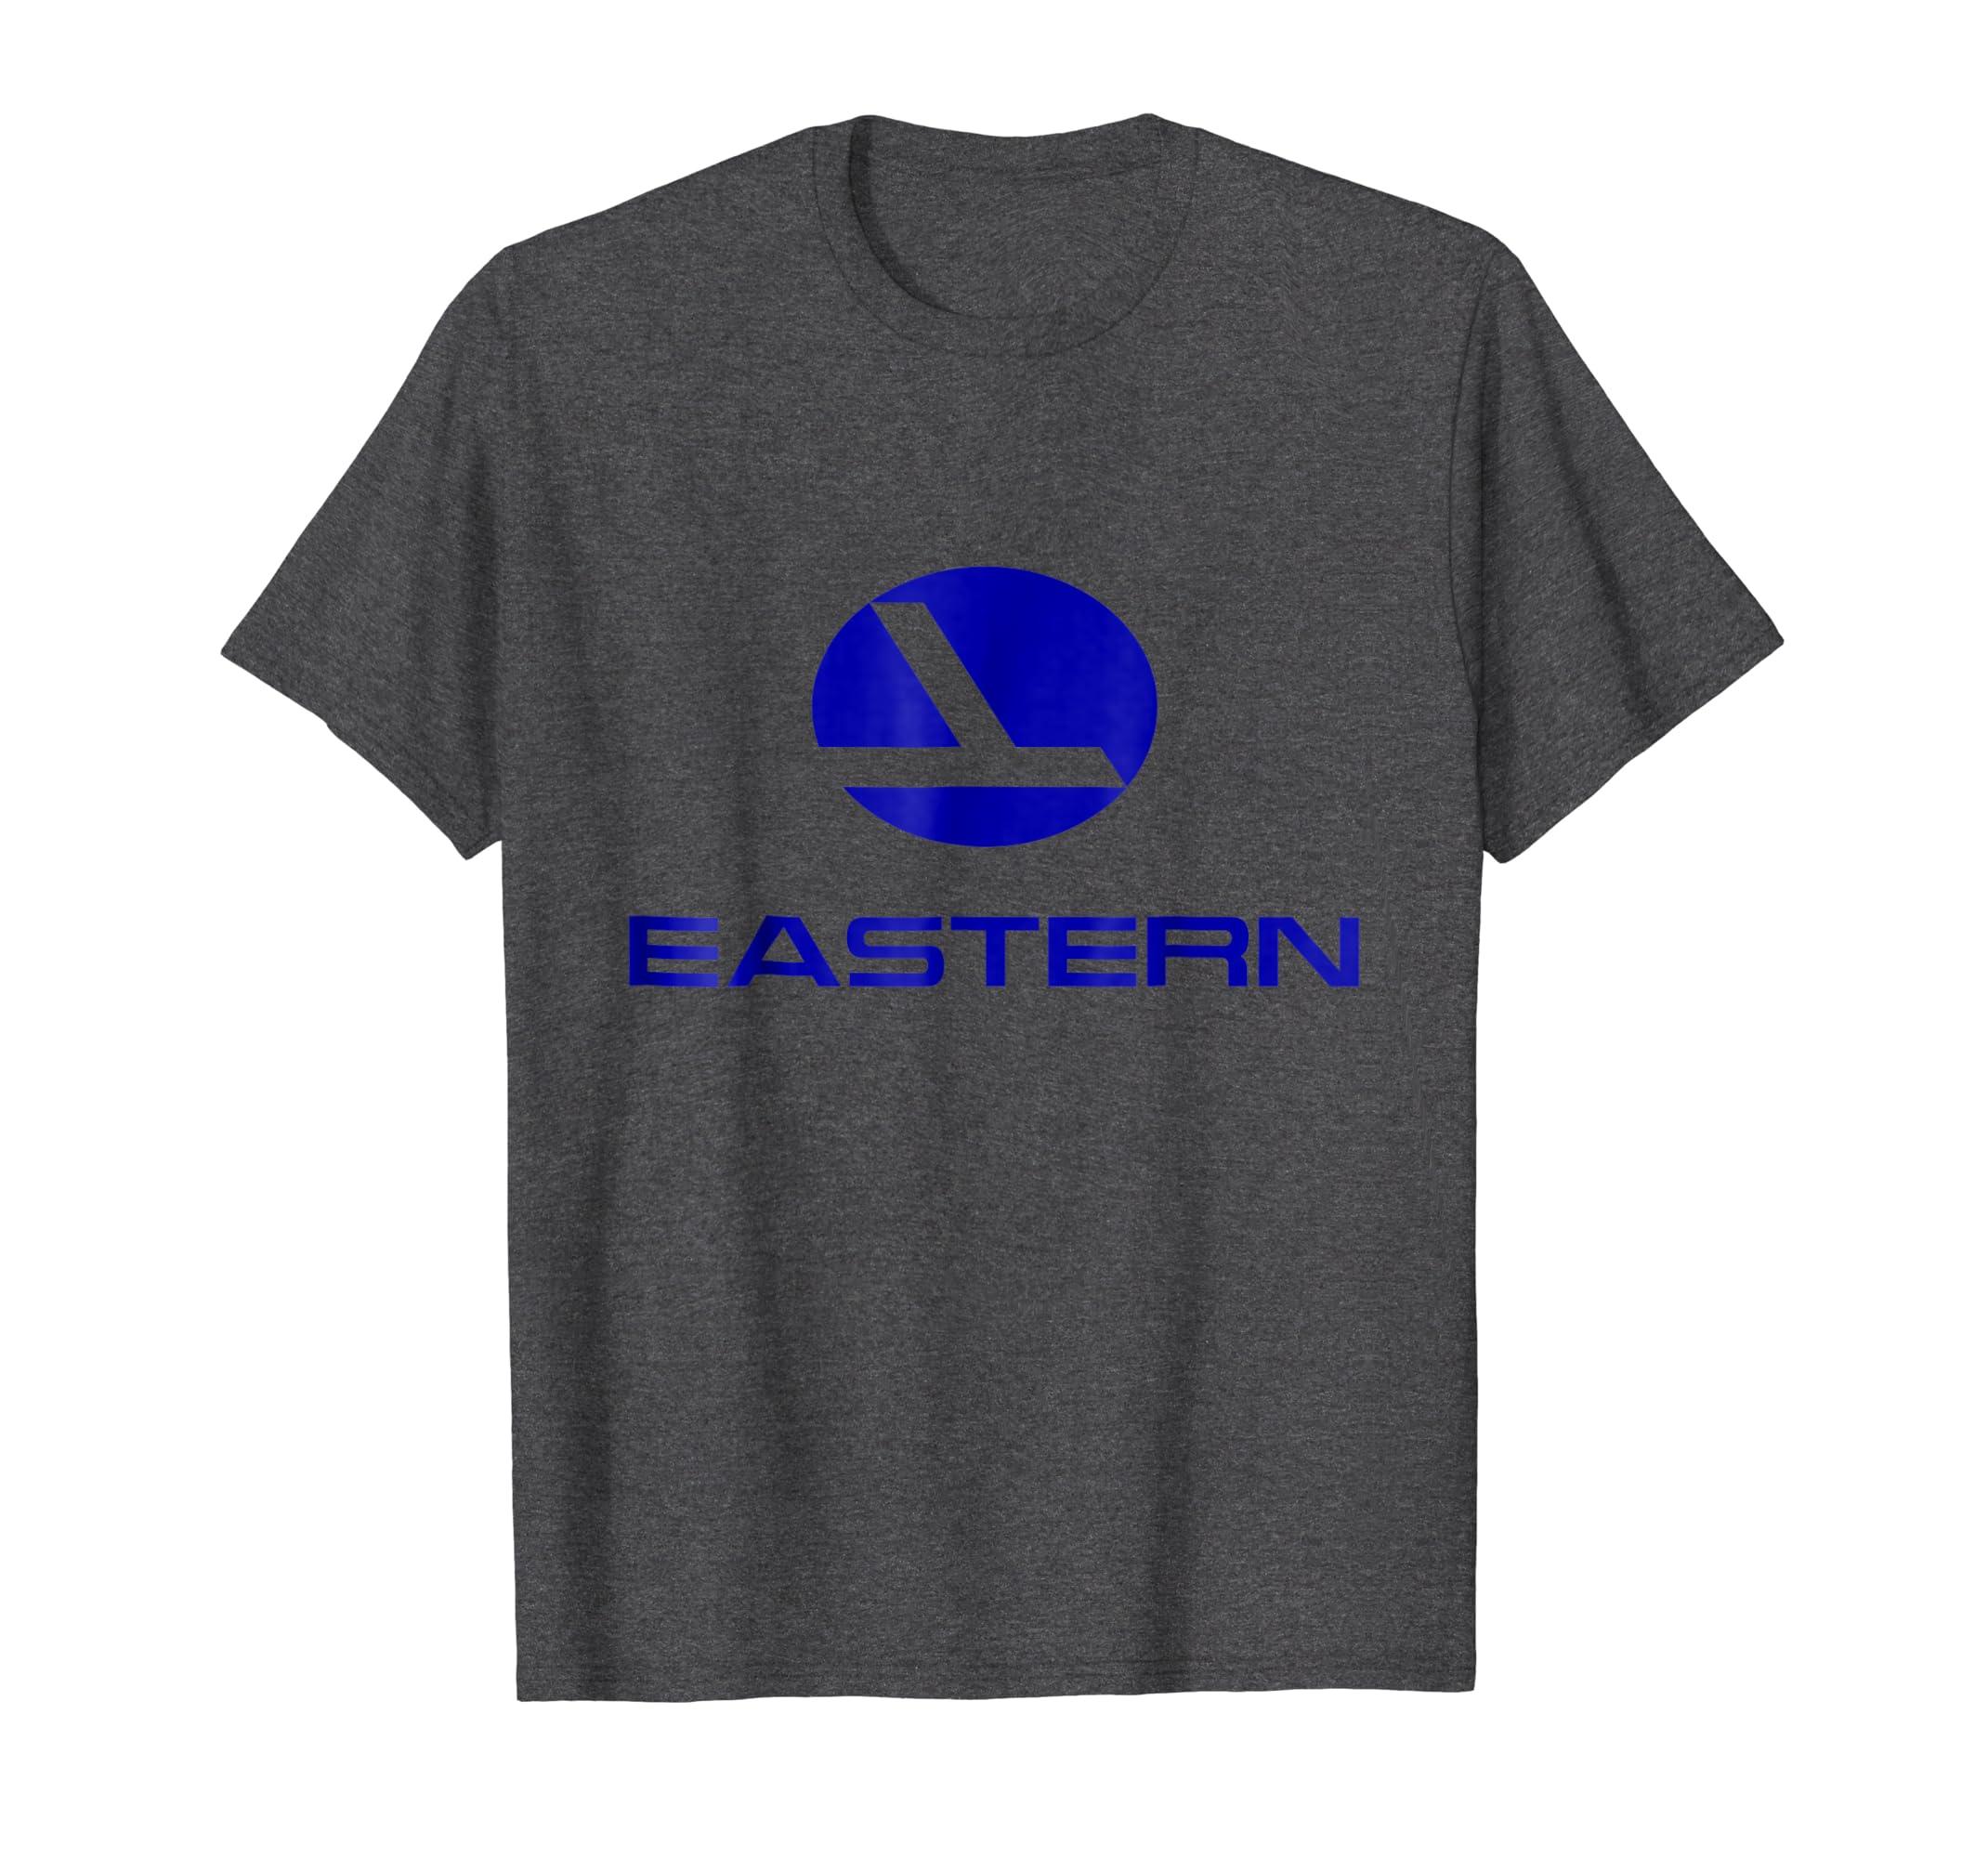 Eastern Airlines T shirt-Awarplus